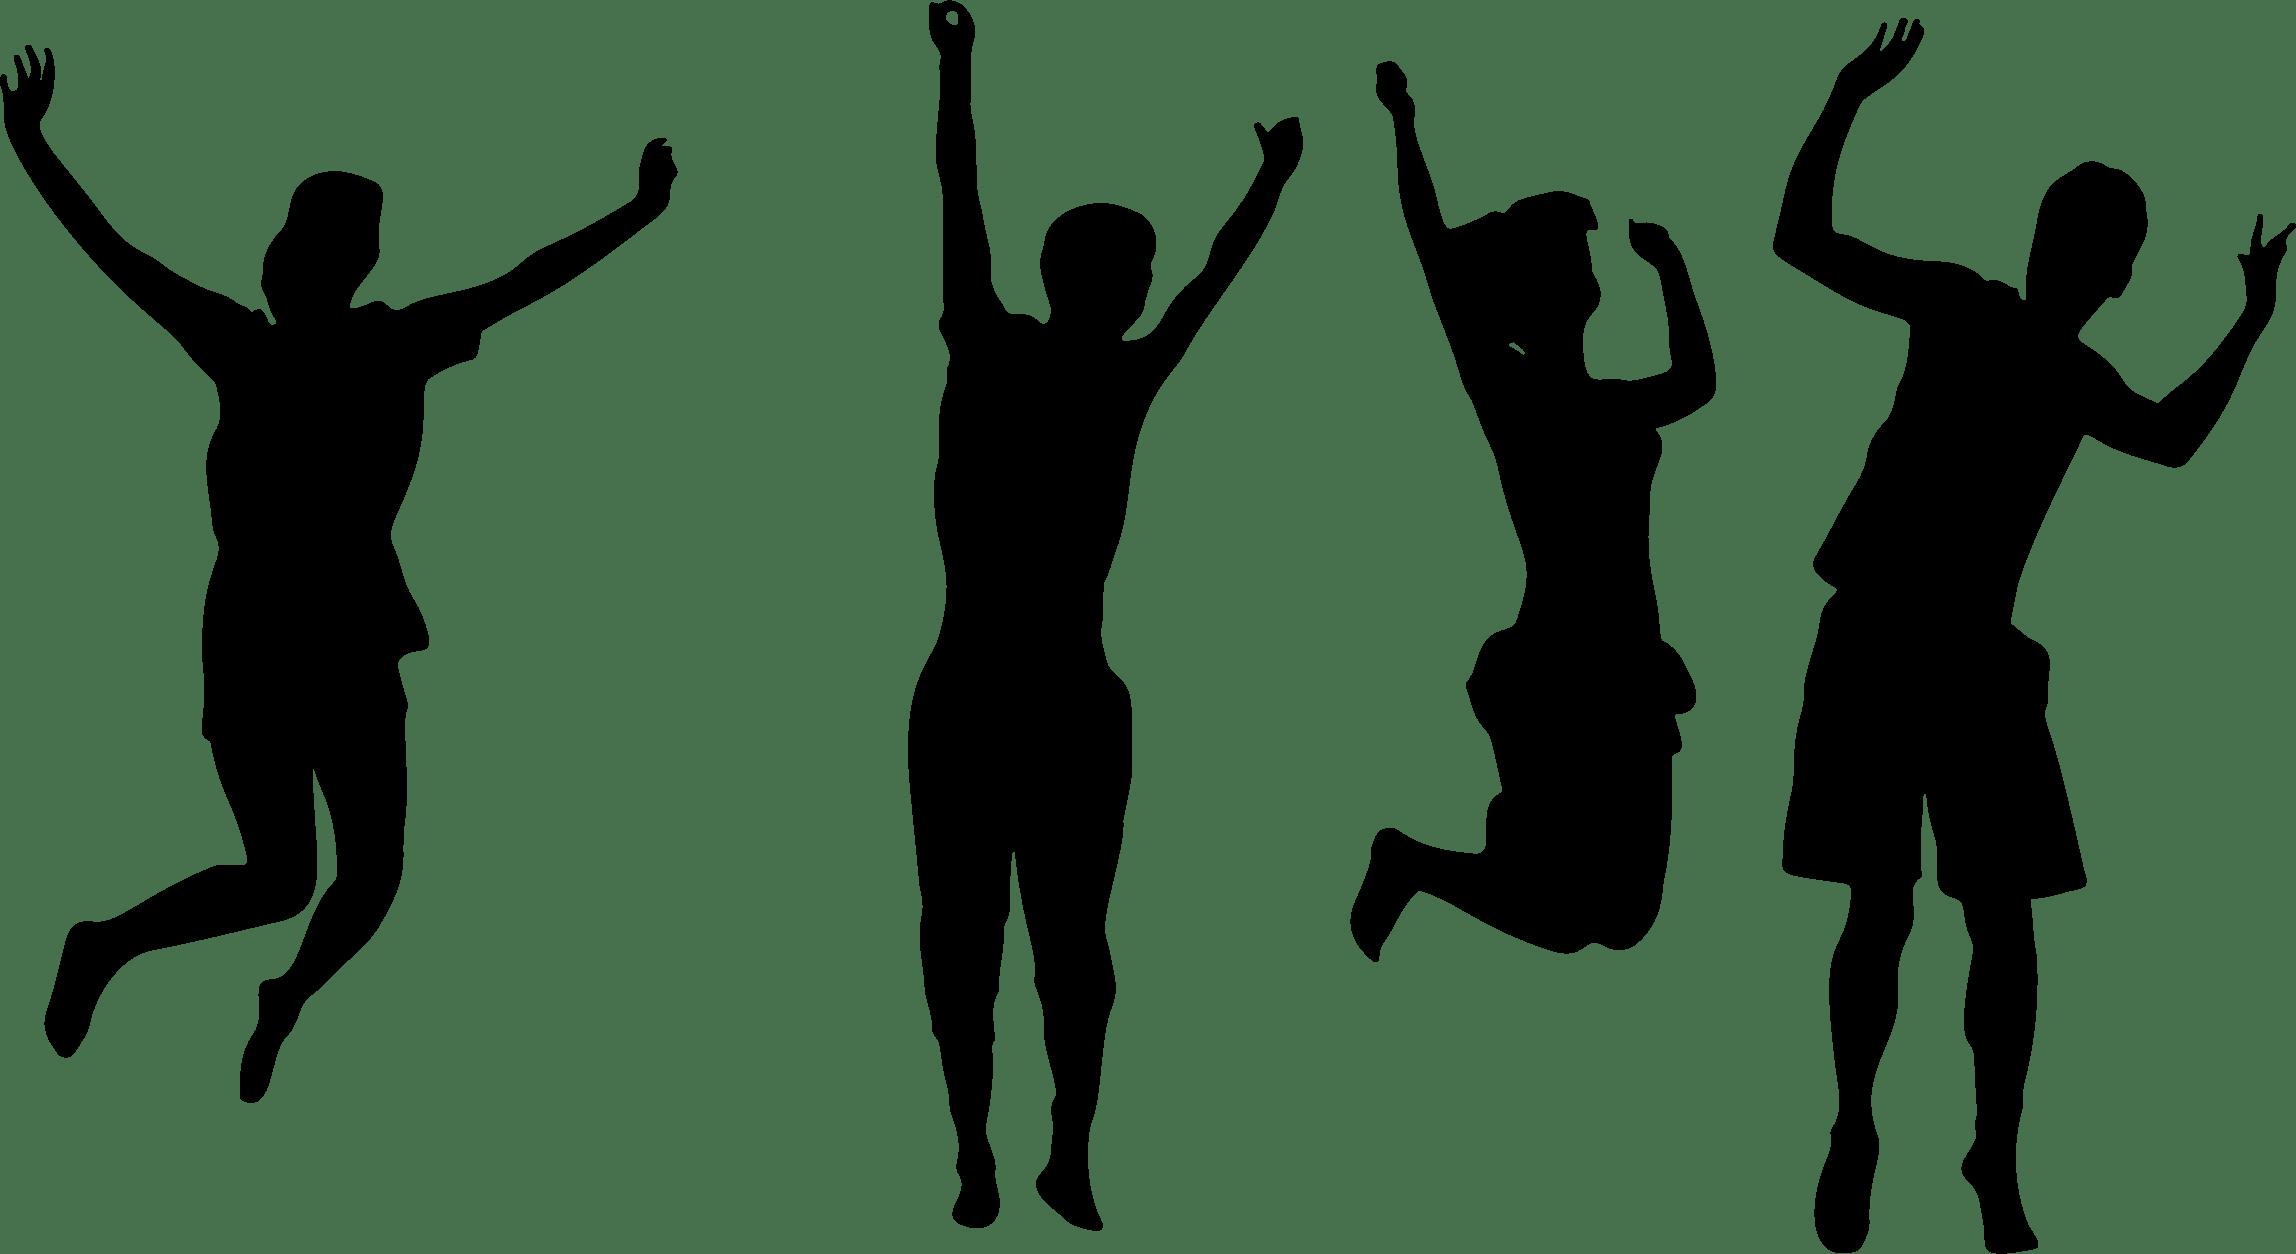 Jumping Clipart Fun Boy Jumping Fun Boy Transparent Free